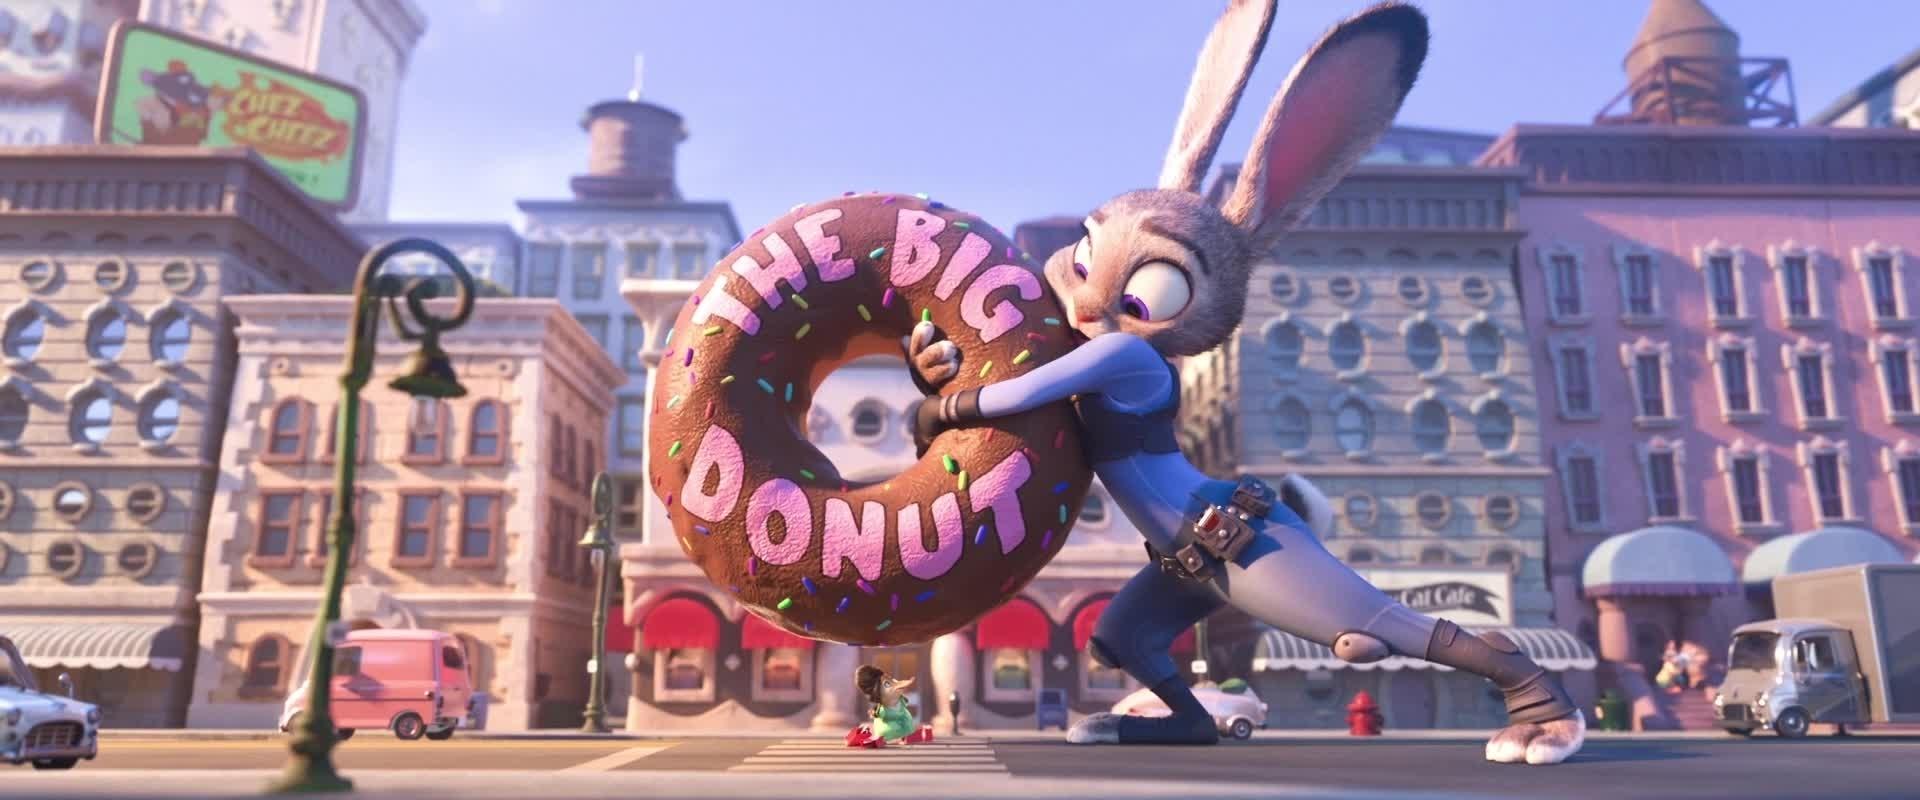 Have A Doughnut